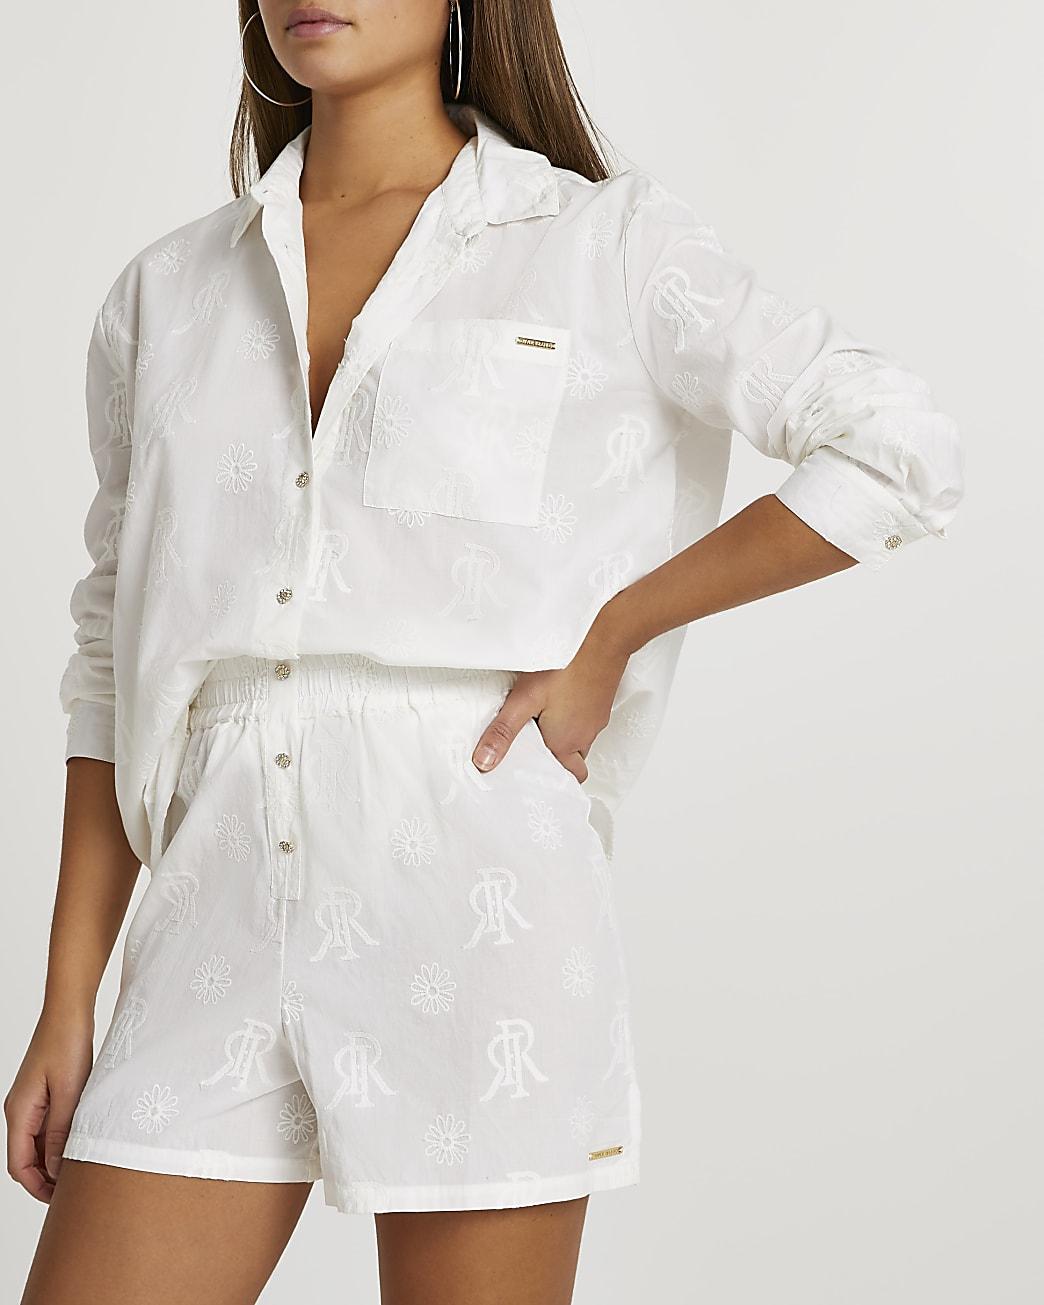 Cream RI embroidered lounge shorts